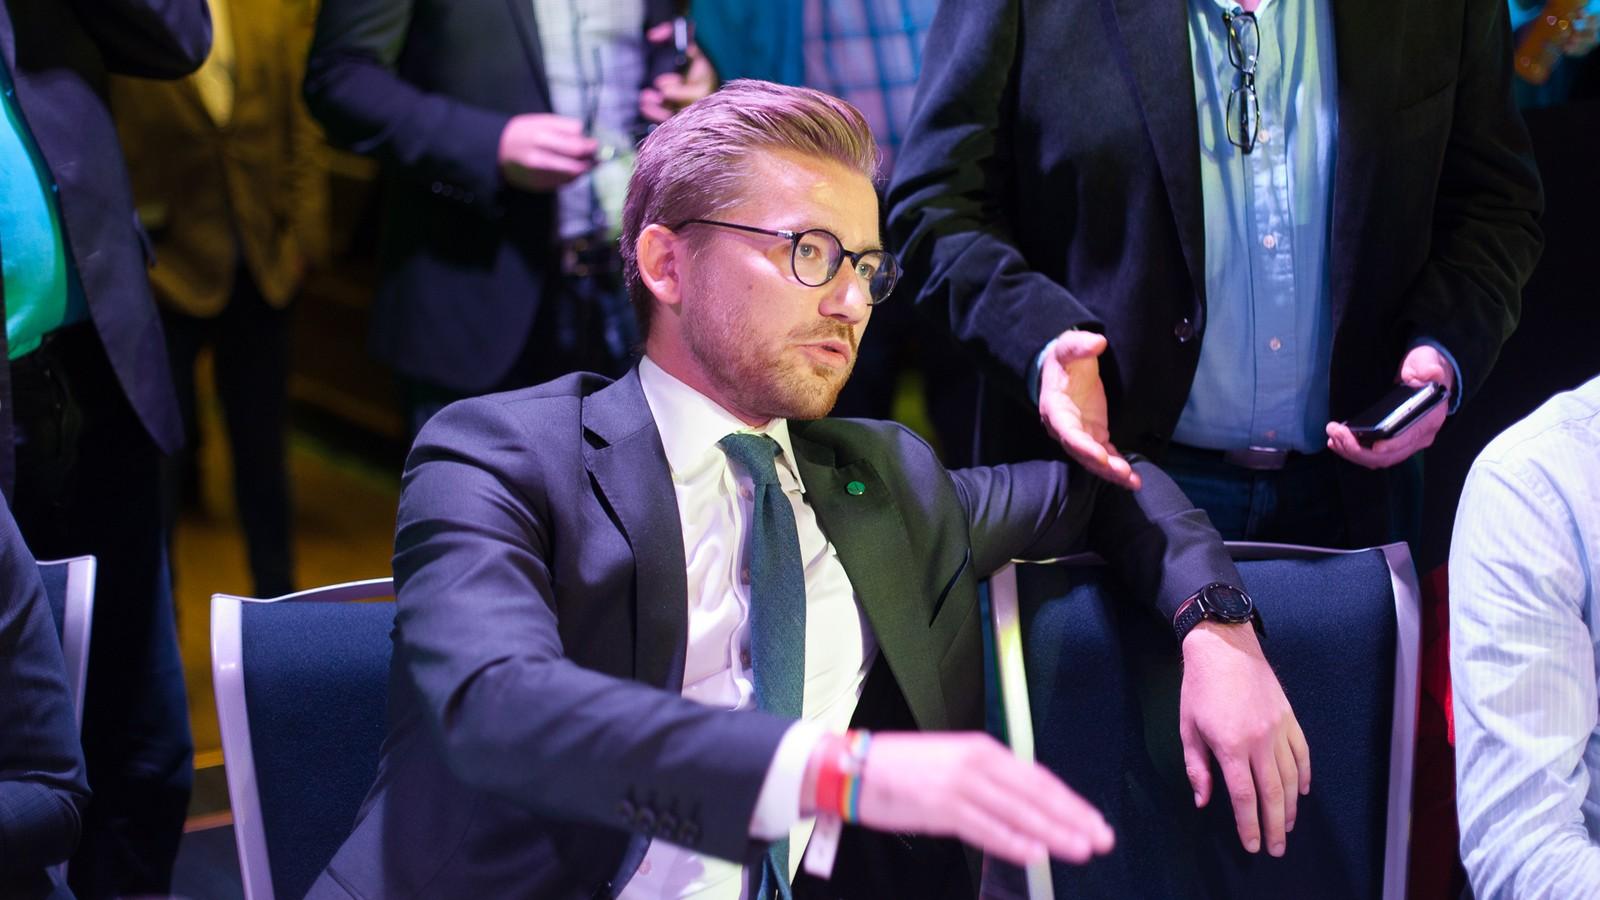 Sveinung Rotevatn frå Venstre følgde utviklinga.